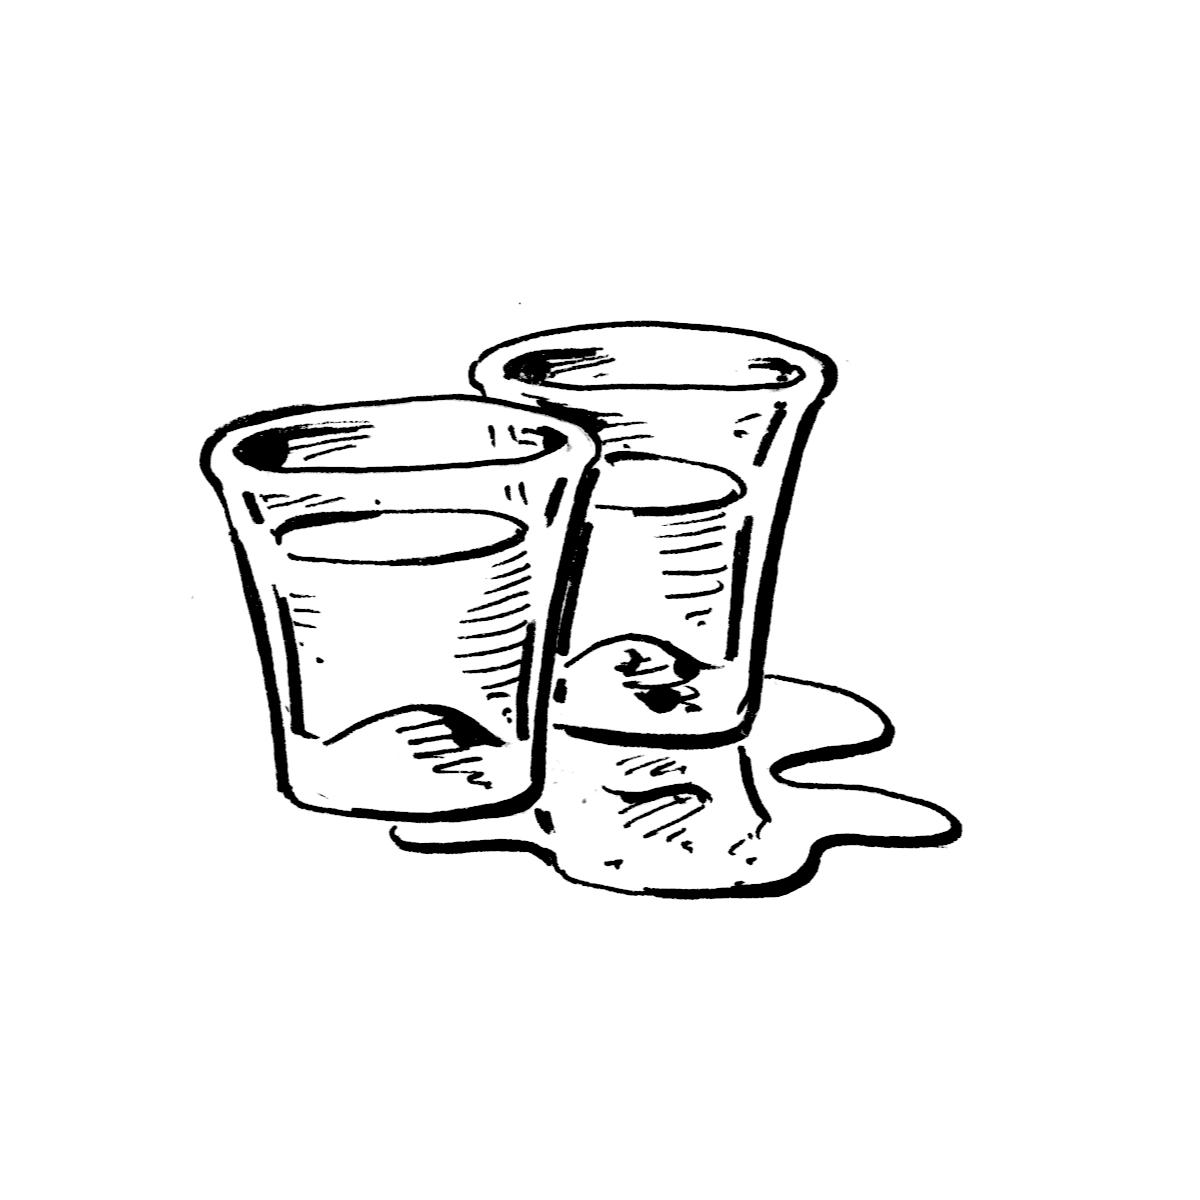 07-vignette-food-menu-hardcore-daouble-alcohol-shooter.jpg